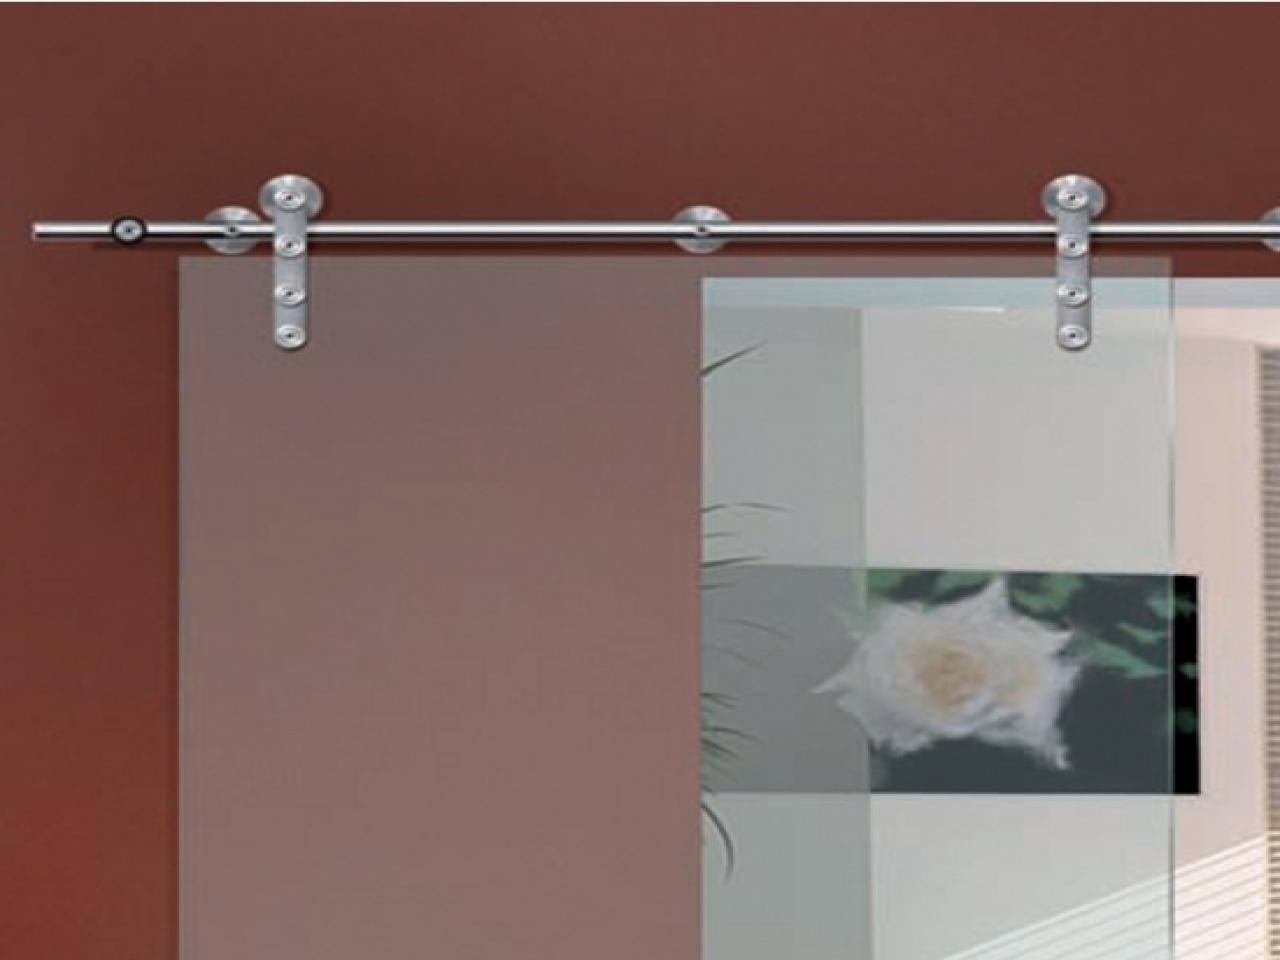 Hafele Glass Sliding Door System